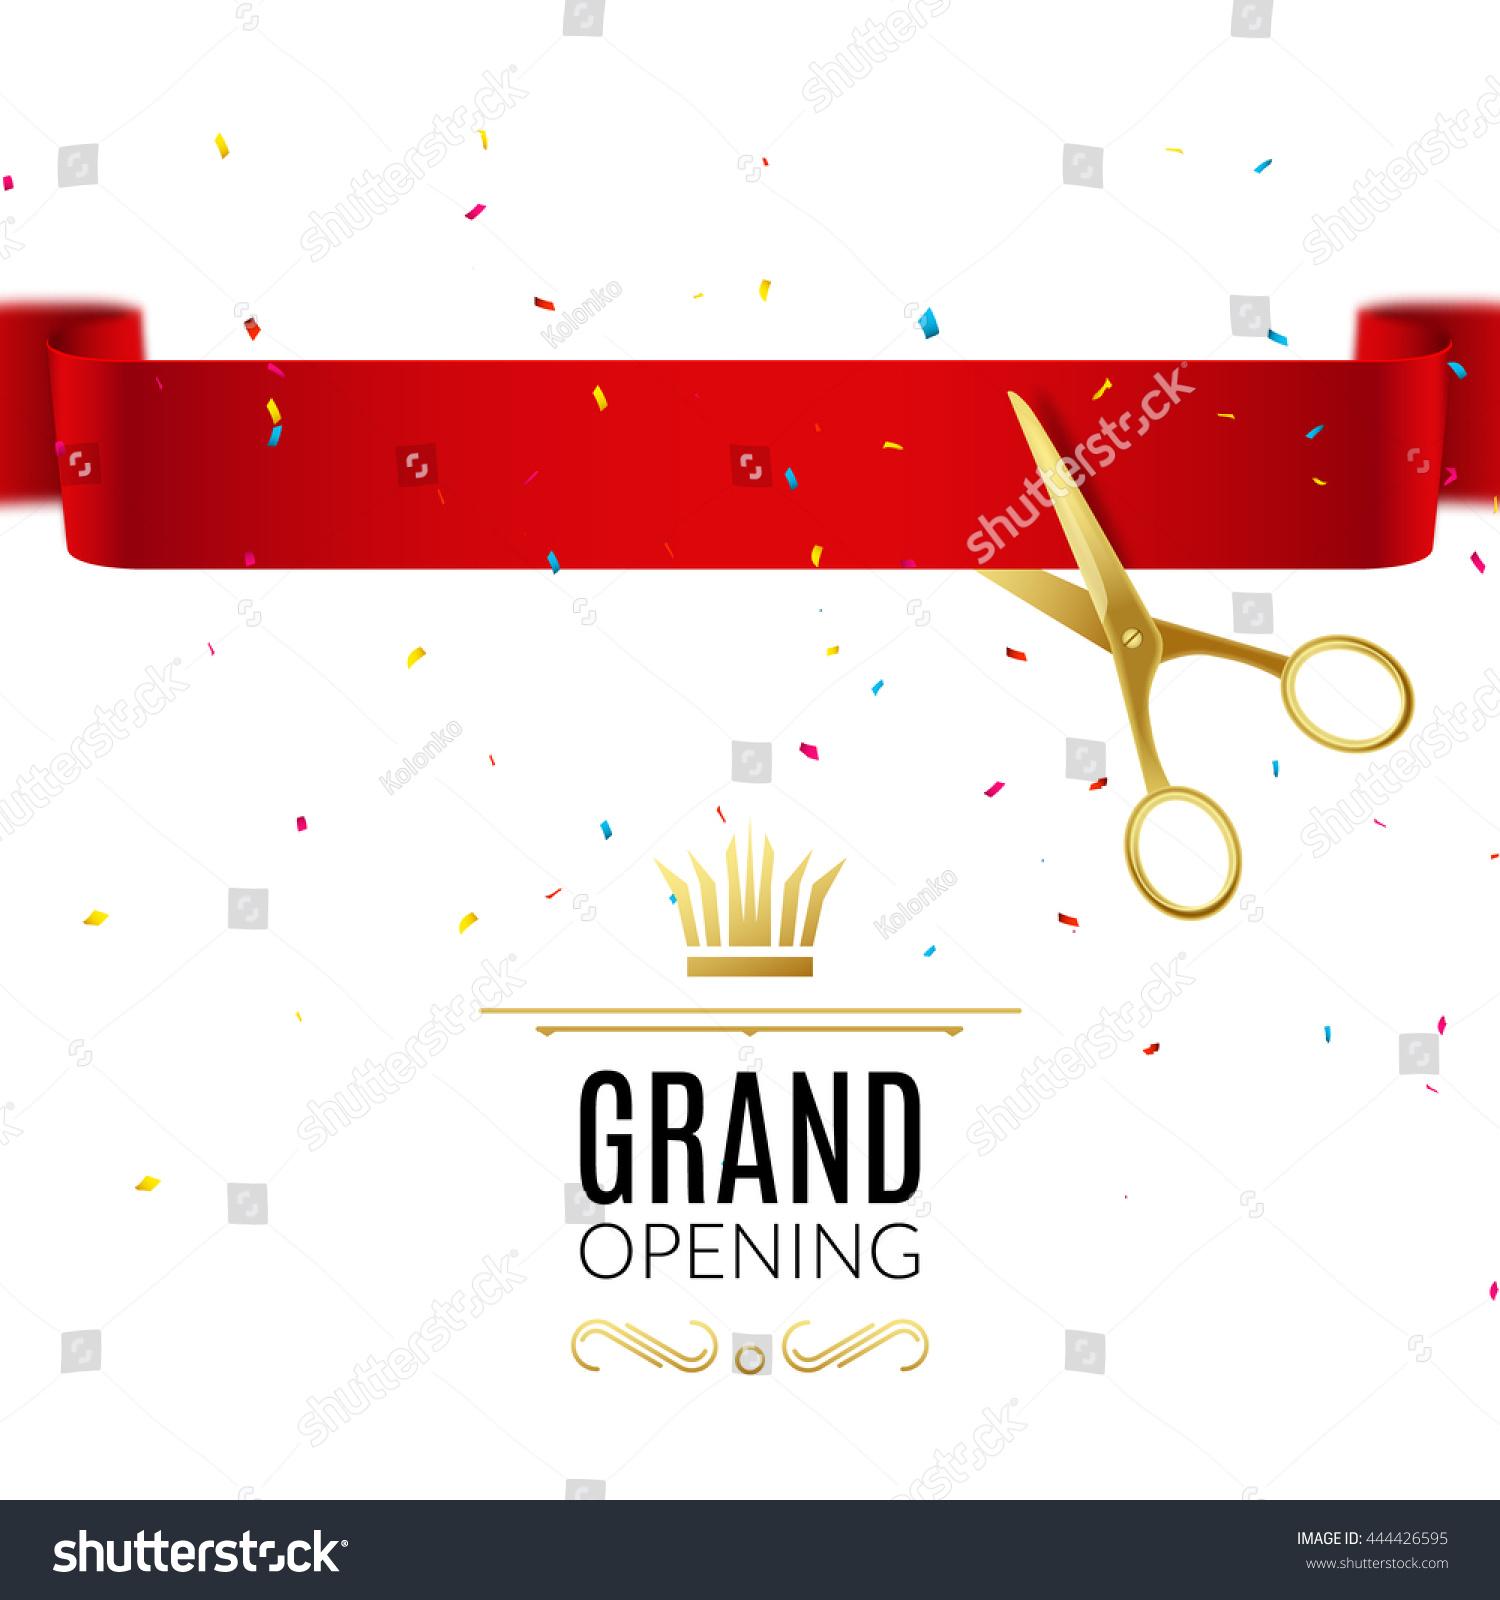 grand opening design template ribbon scissors stock vector 444426595 shutterstock. Black Bedroom Furniture Sets. Home Design Ideas